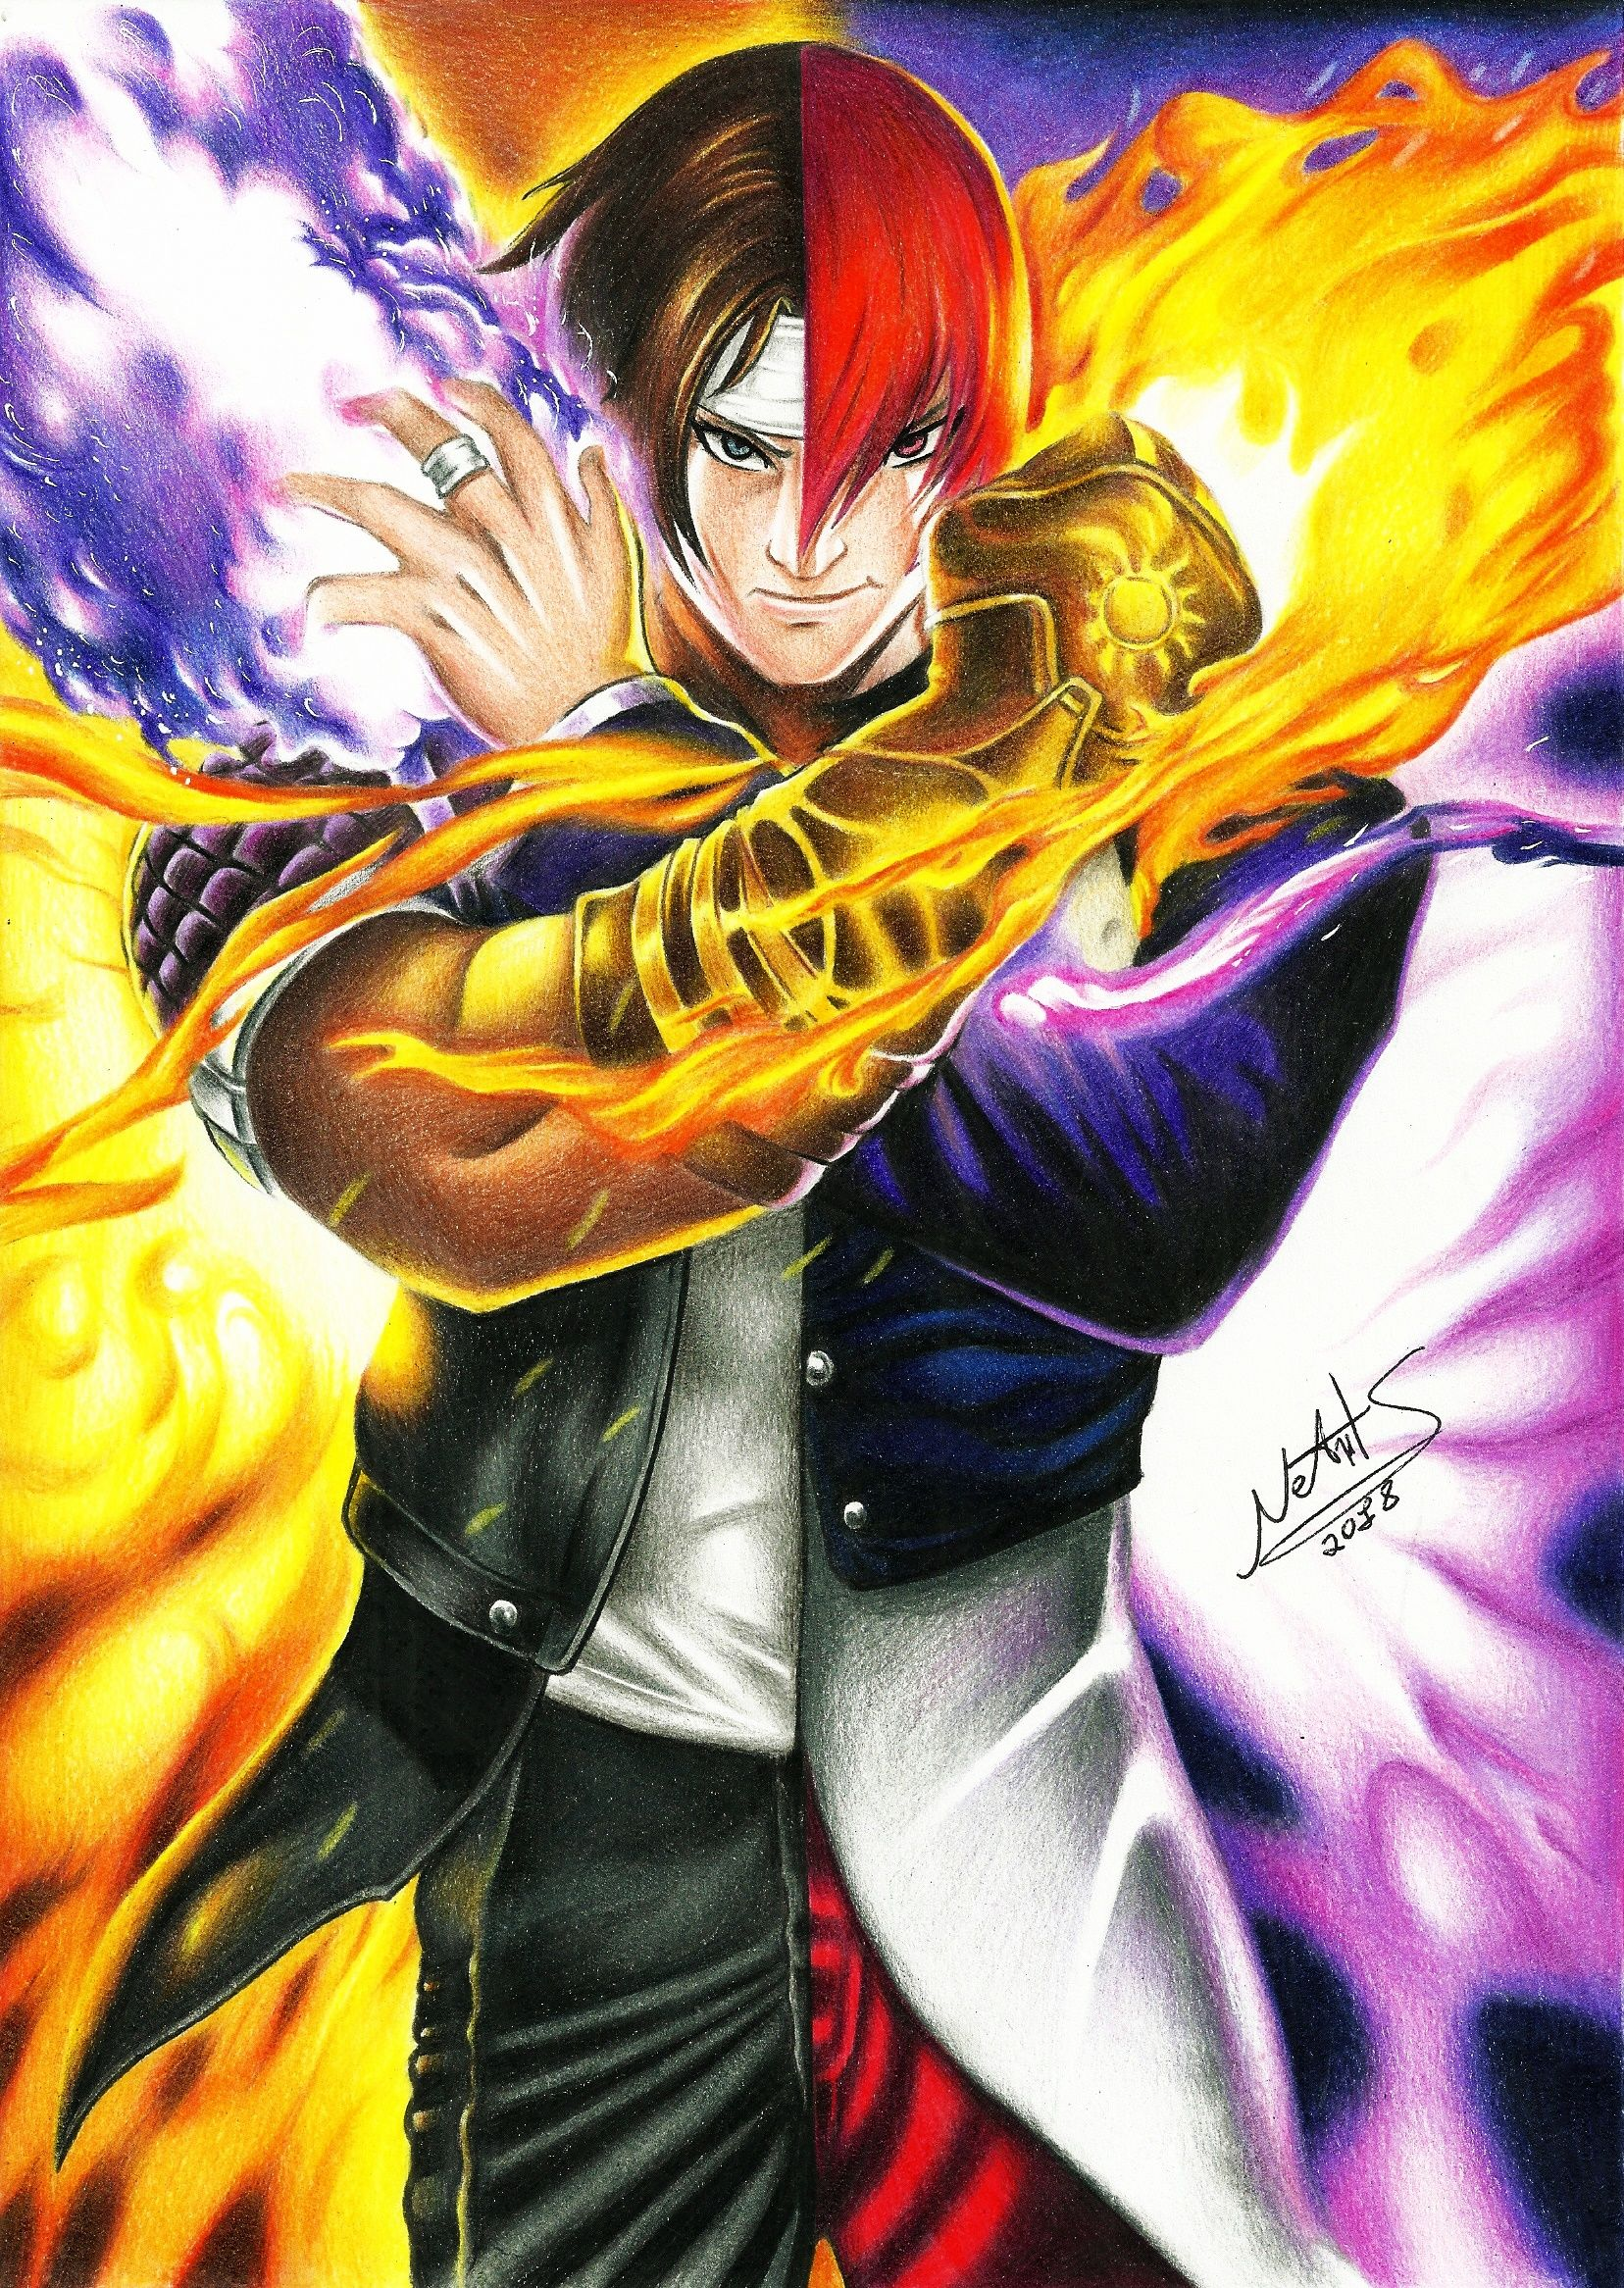 Speed Drawing Kyo Kusanagi Iori Yagami King Of Fighters Collab King Of Fighters Street Fighter Art Fighter